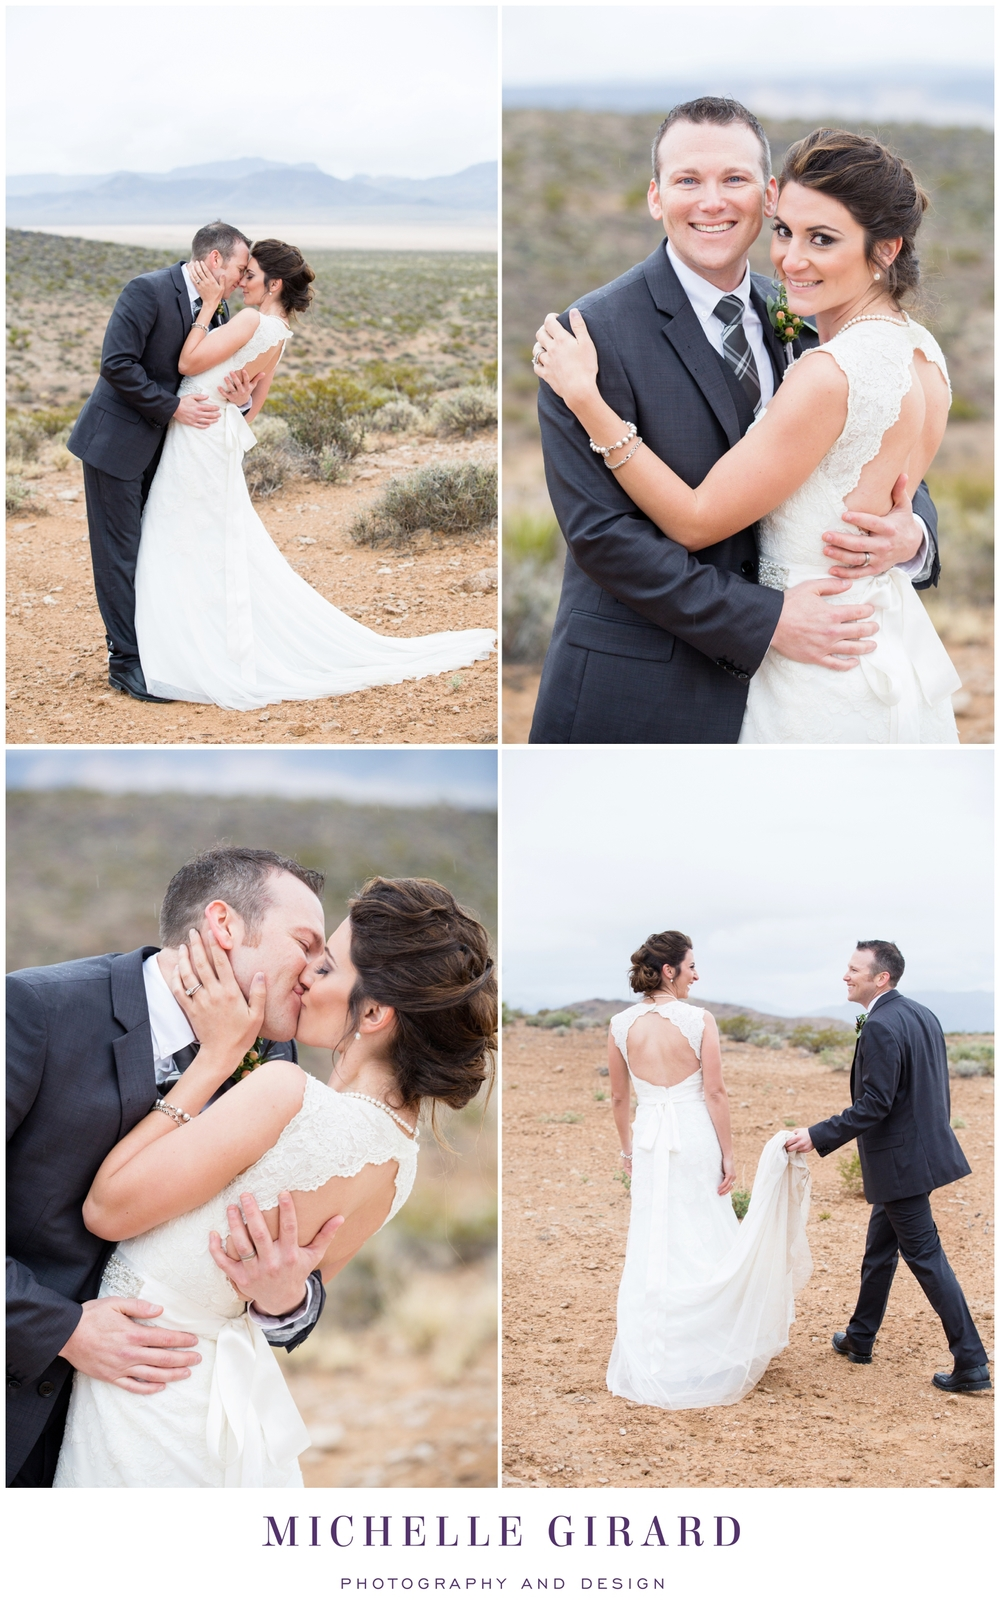 las-vegas-desert-wedding-bride-groom-photography-nevada-michelle-girard-15.jpg